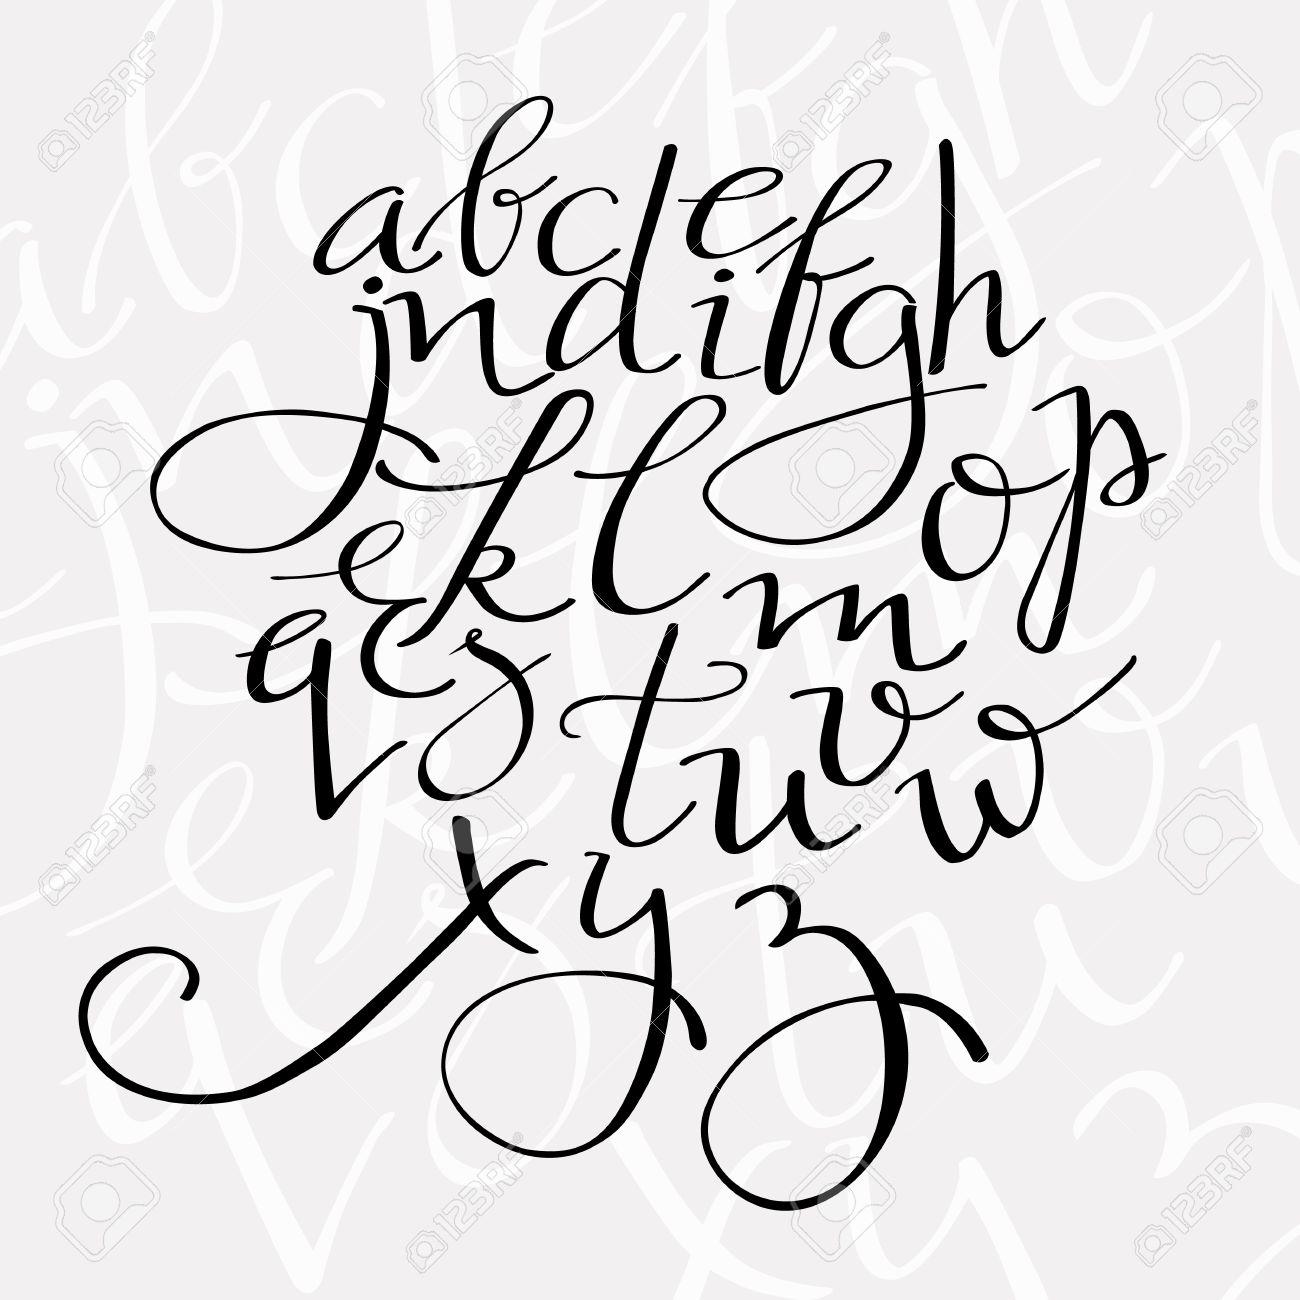 flourish script alphabet, elegant swirl font for menu or wedding invitation titles - 45072075